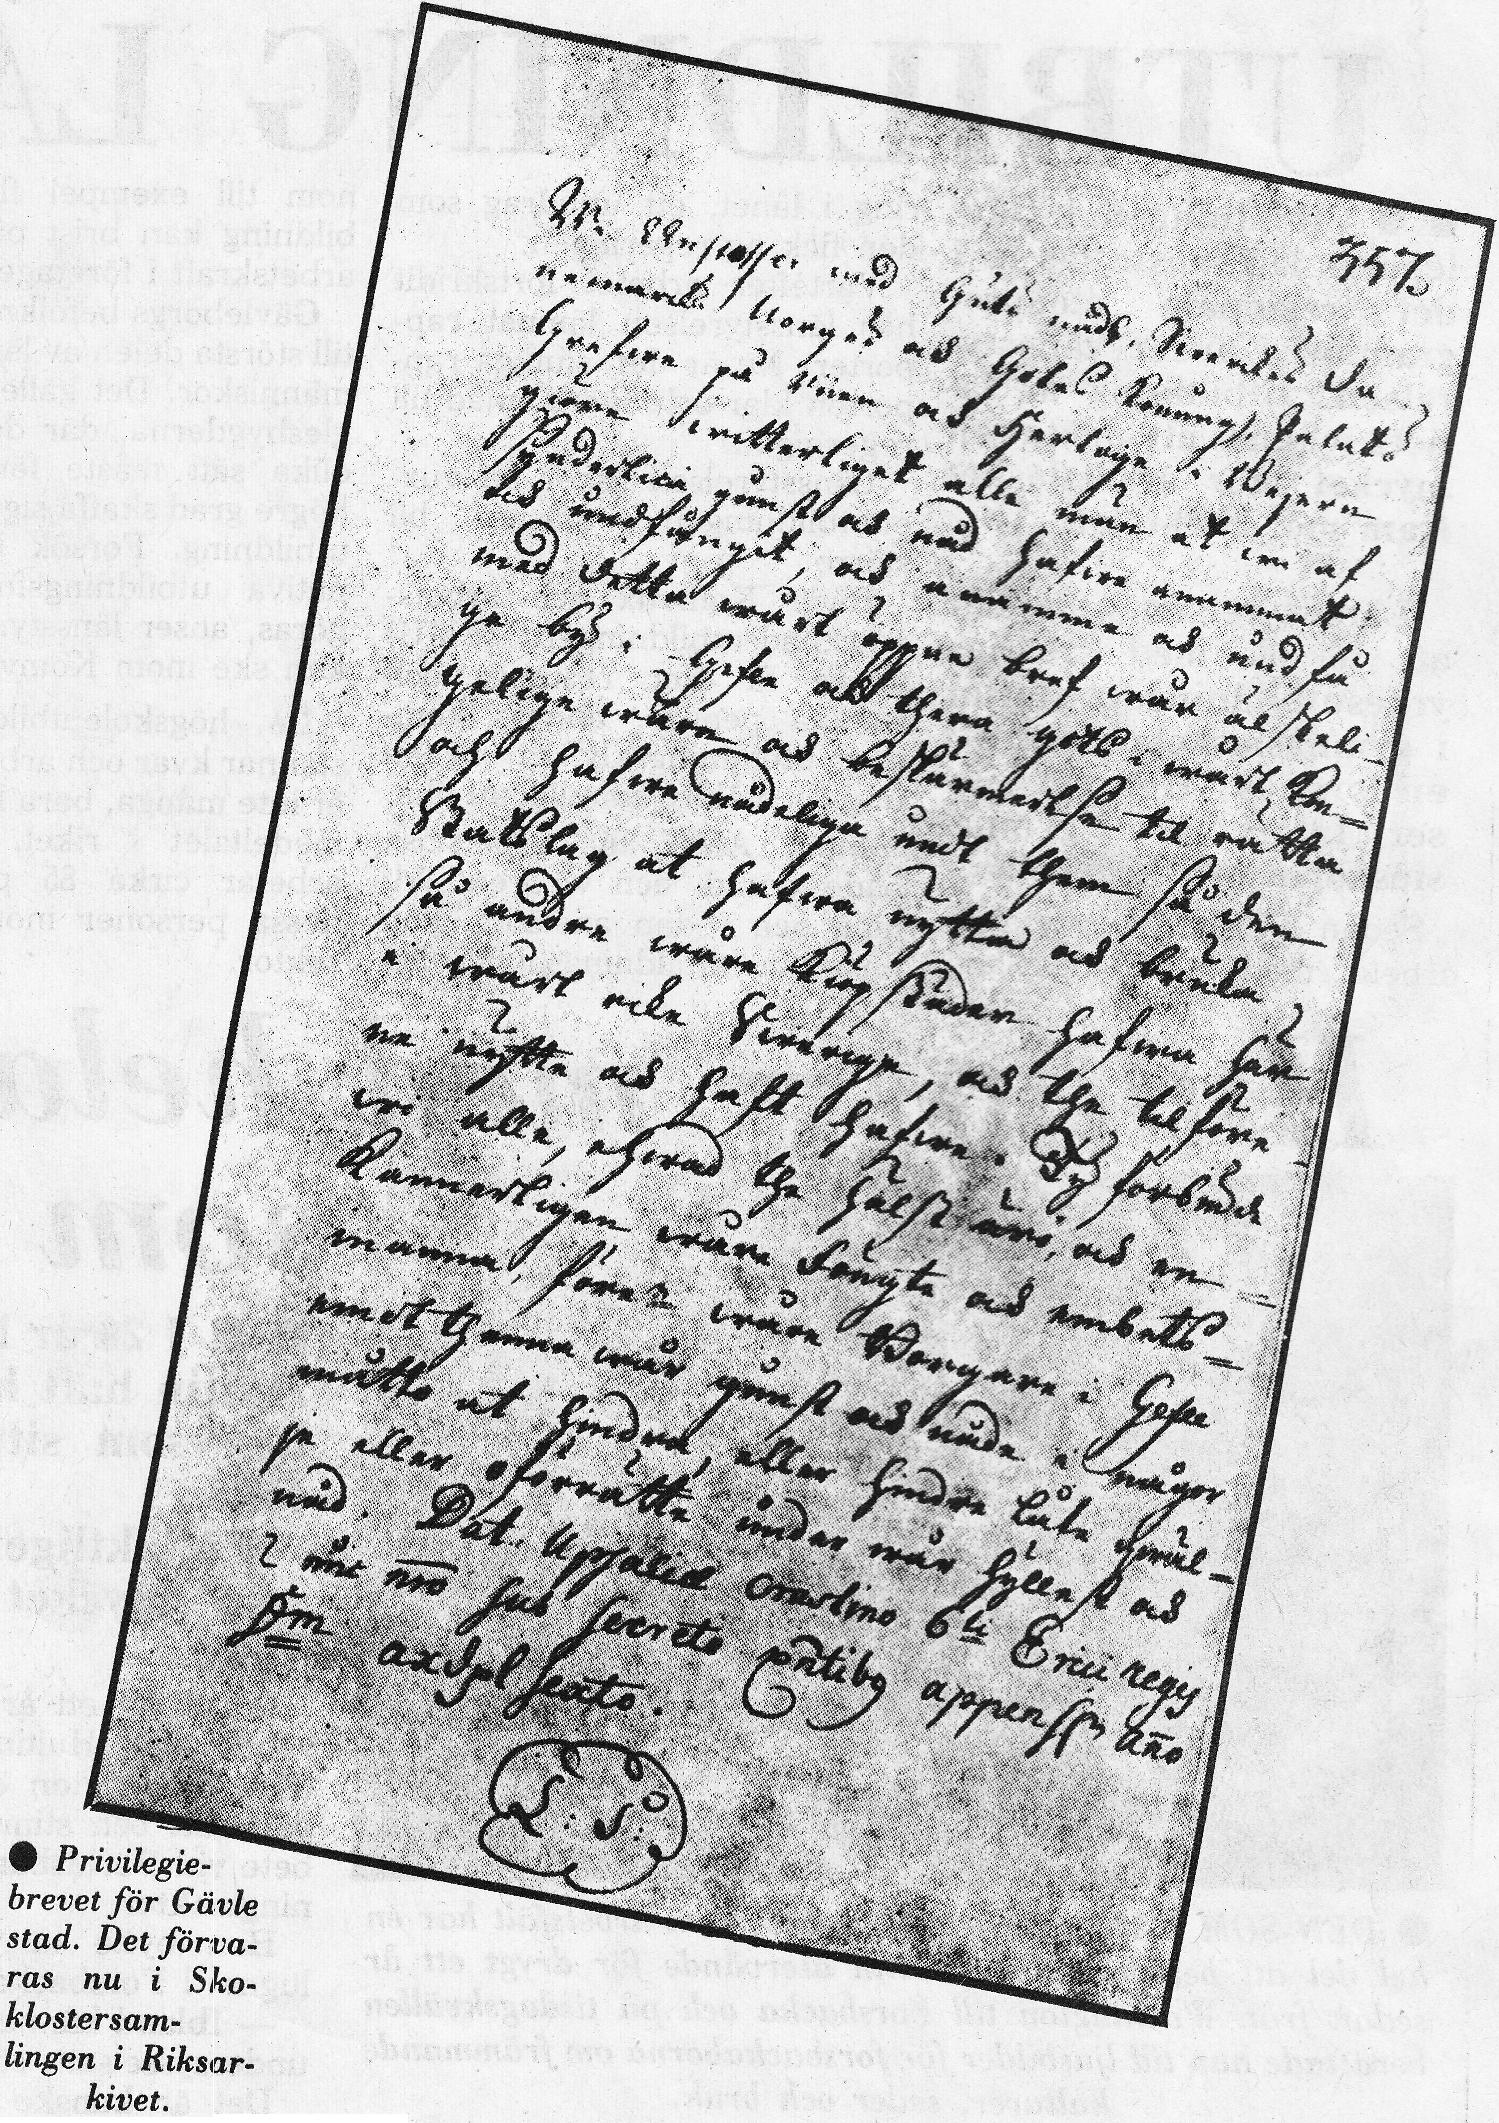 Privilegiebrevet 1446